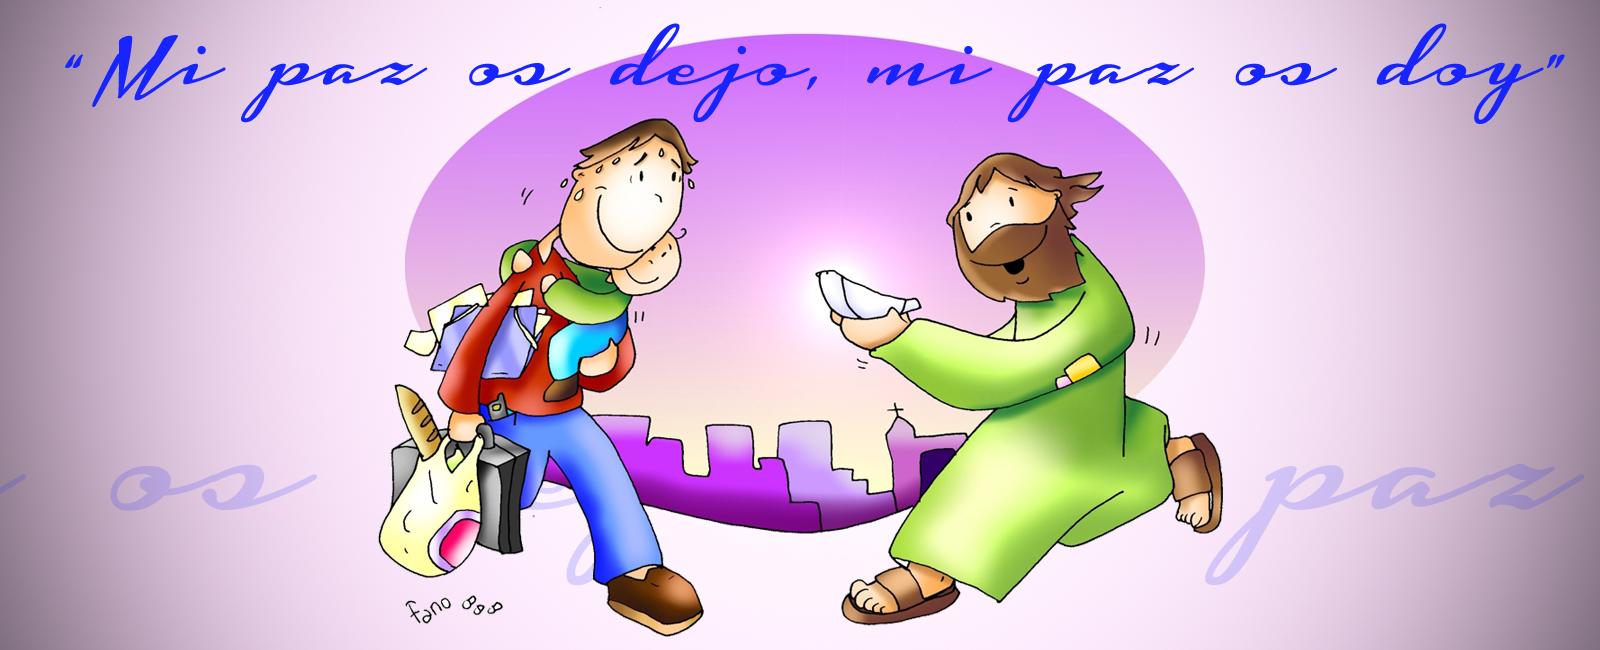 Parroquia El Altet - Evangelio Domingo 26 de Mayo 2019